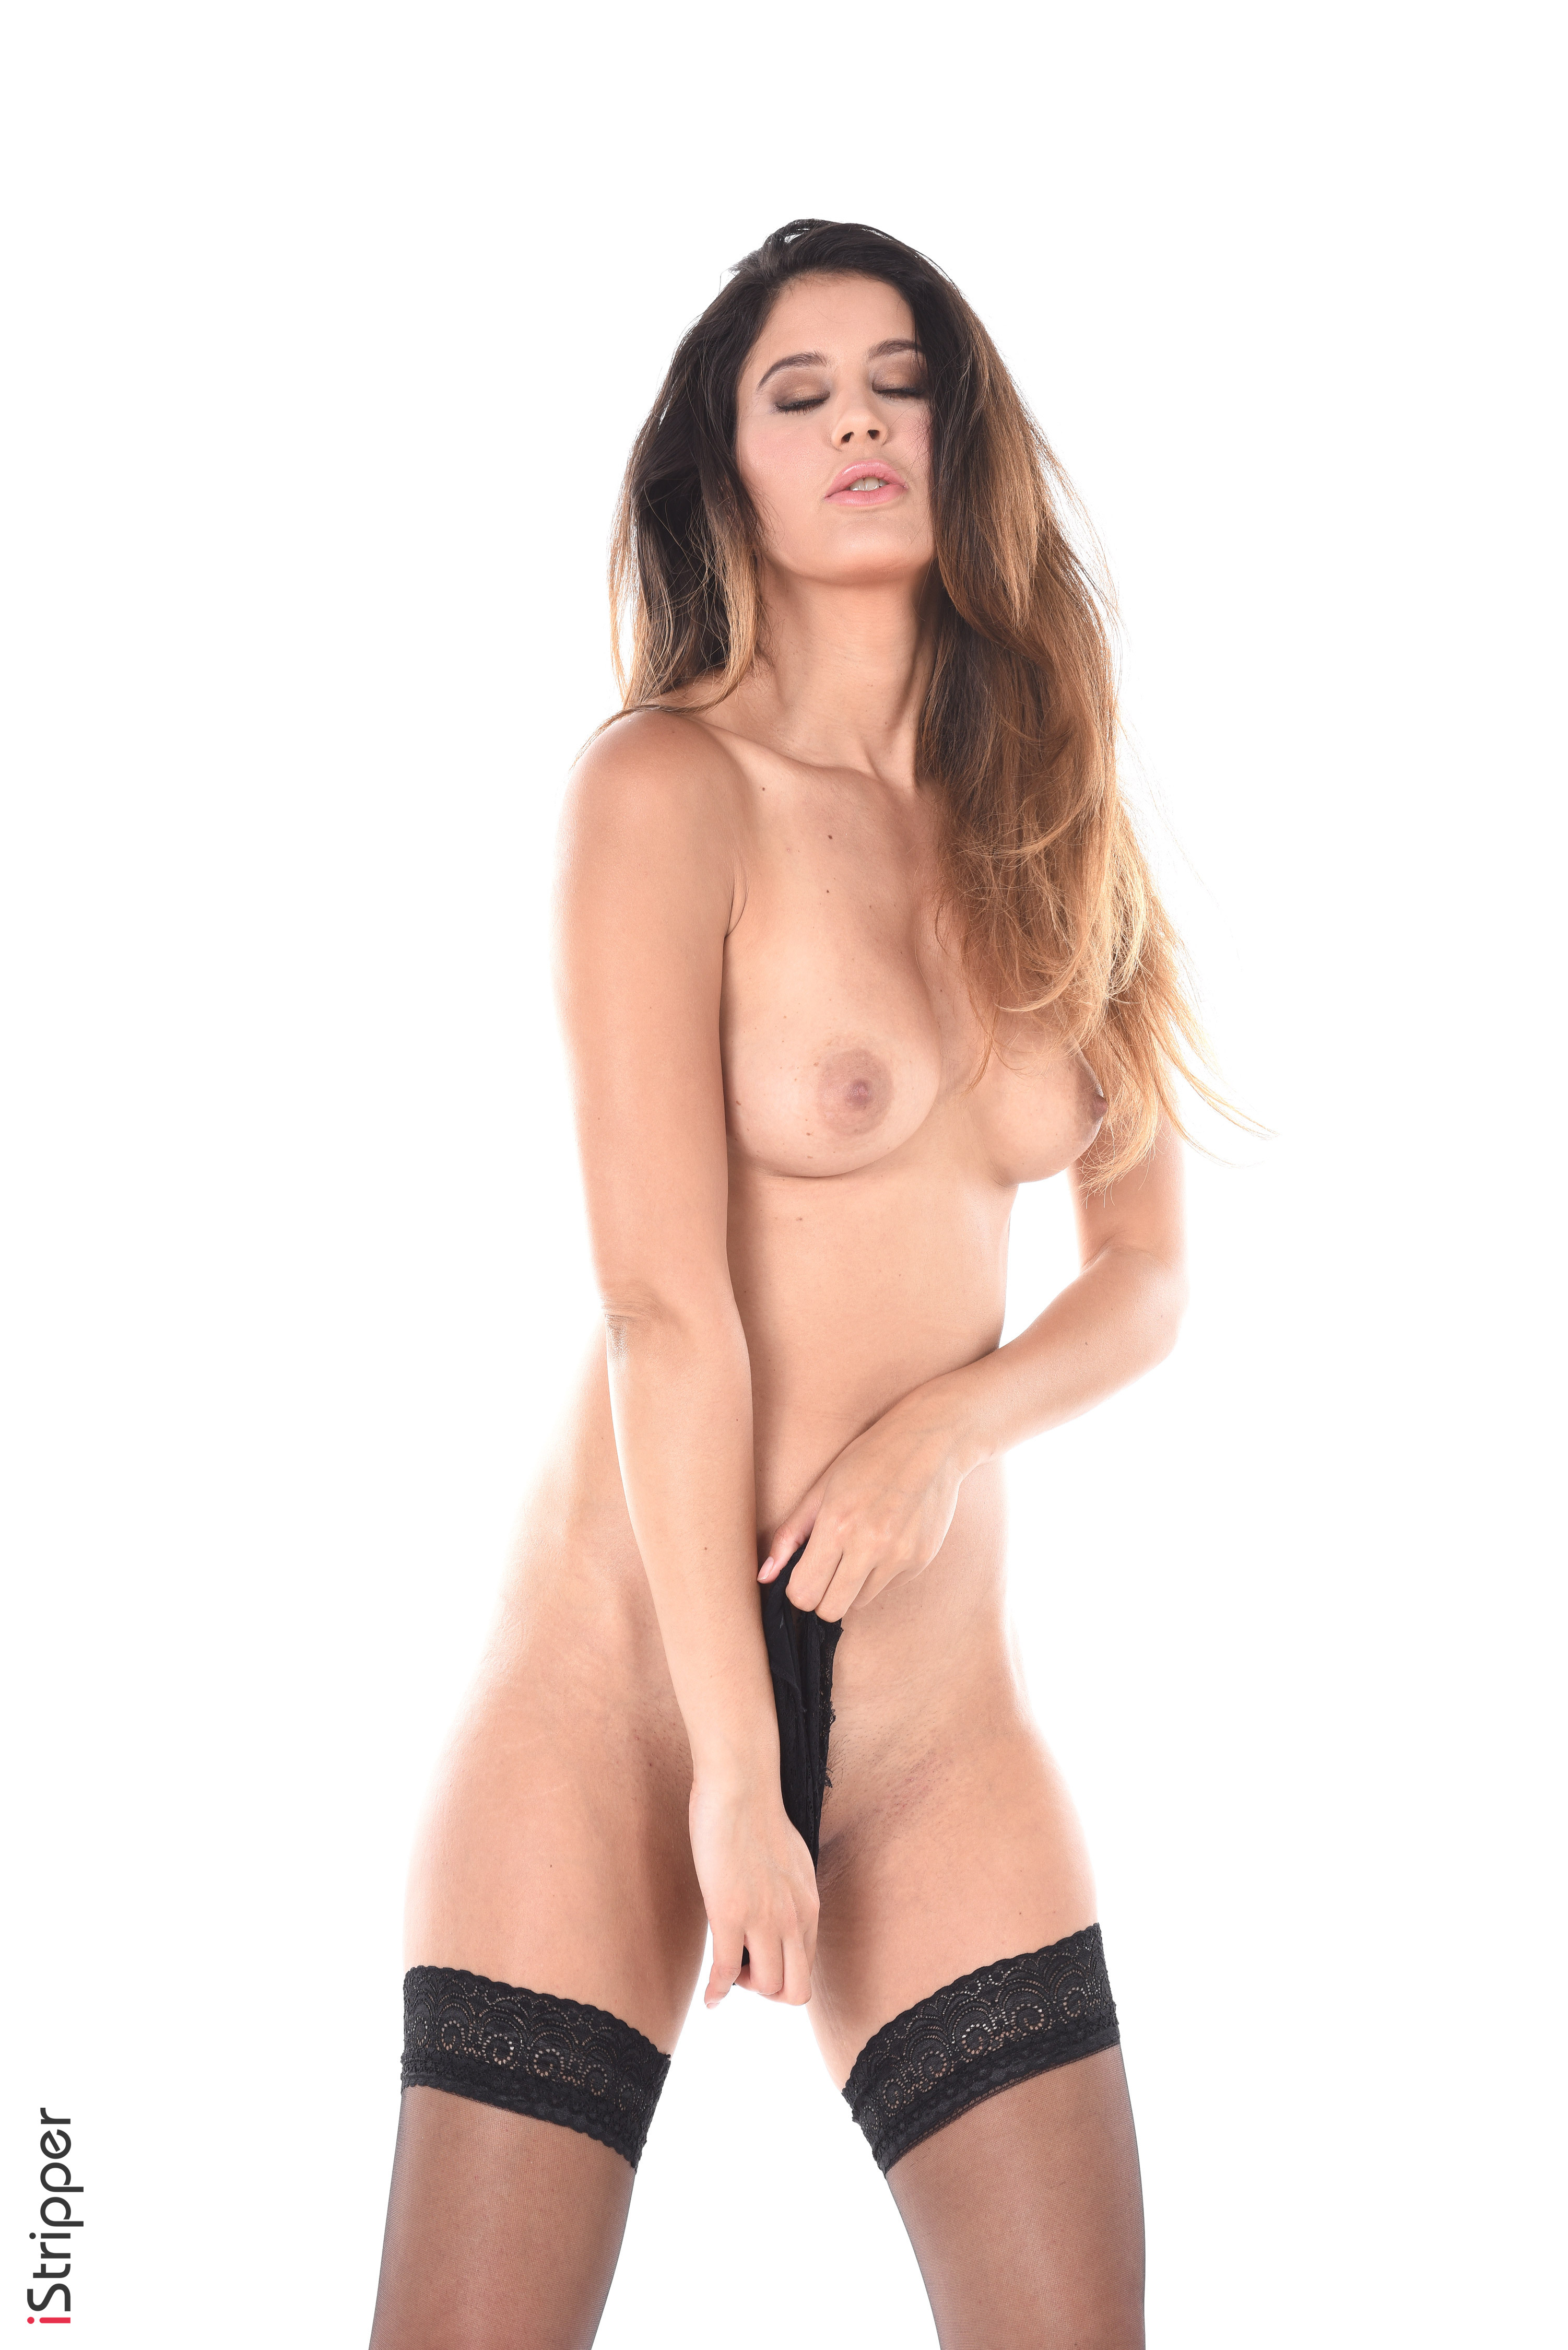 aleska diamond sexy striptease nude